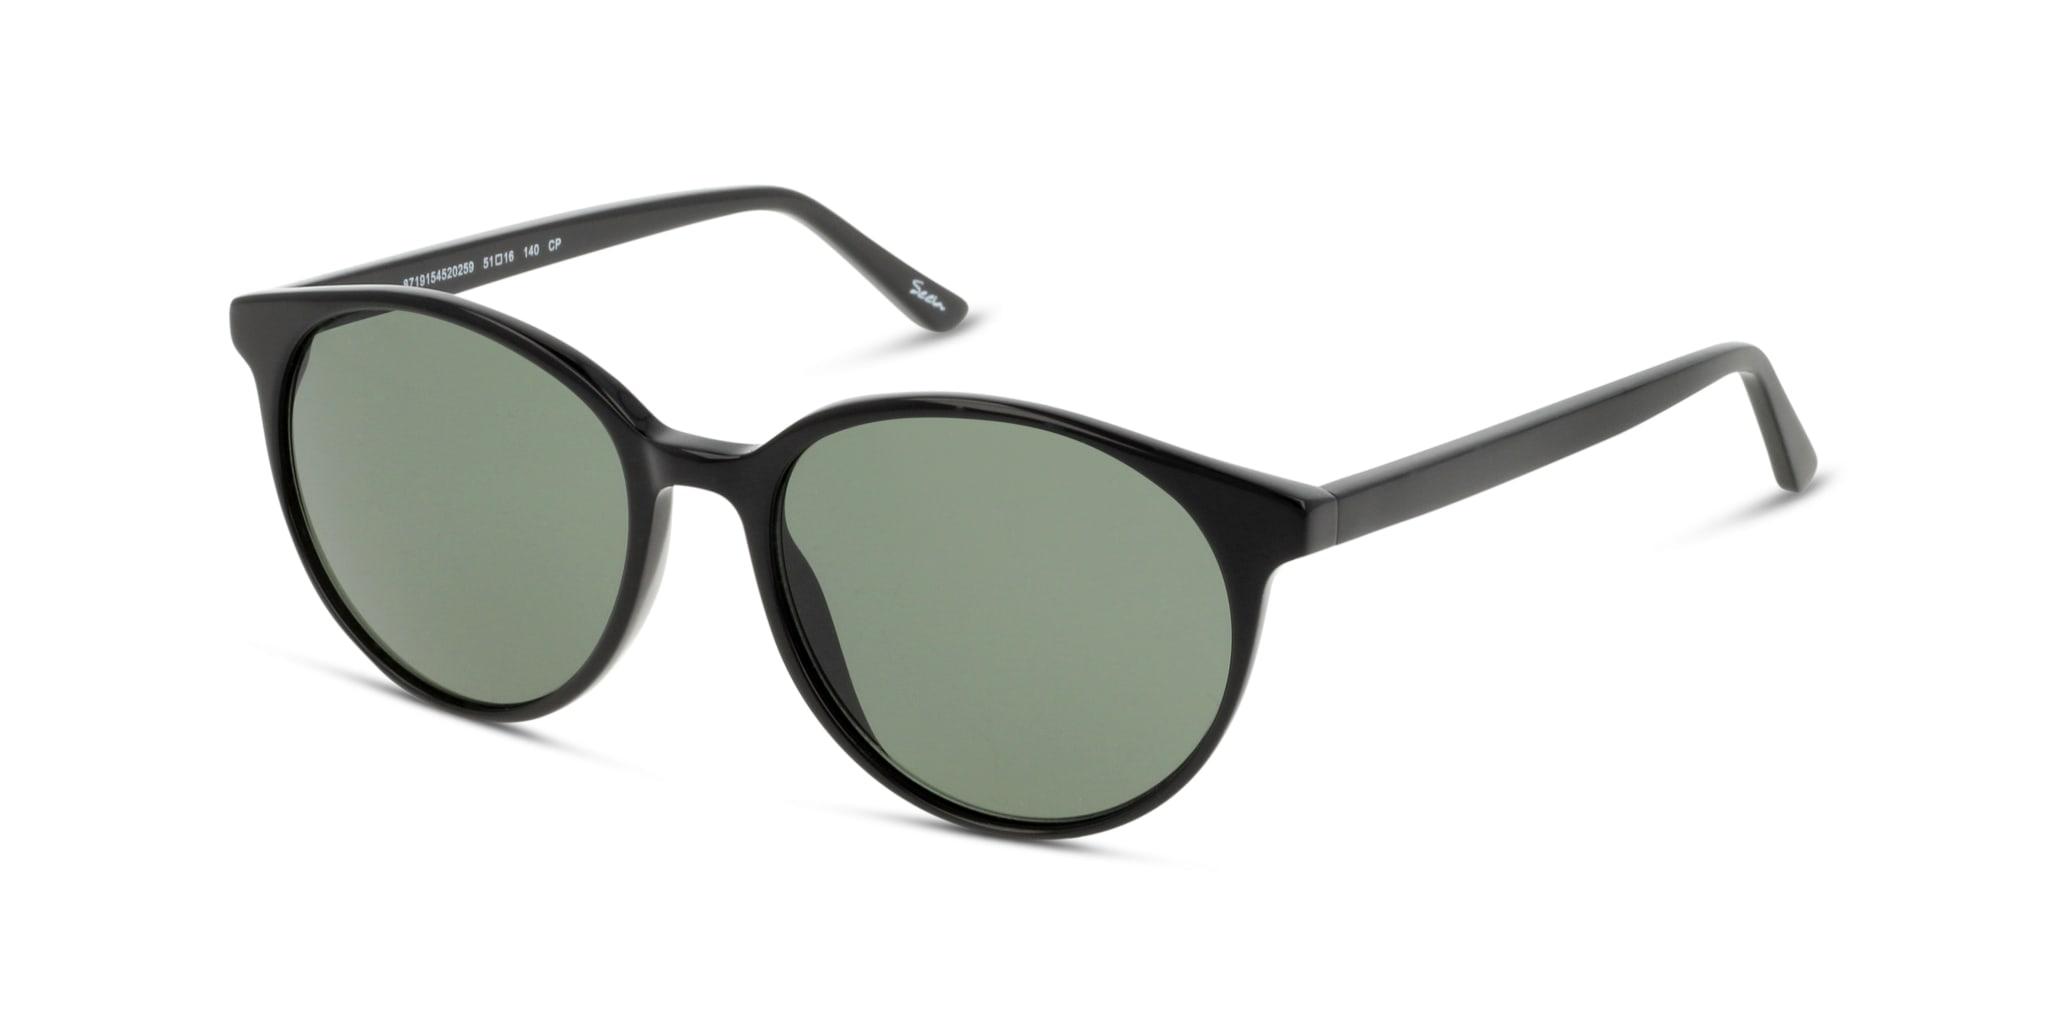 8719154597459-angle-03-seen-rcjf07-eyewear-black